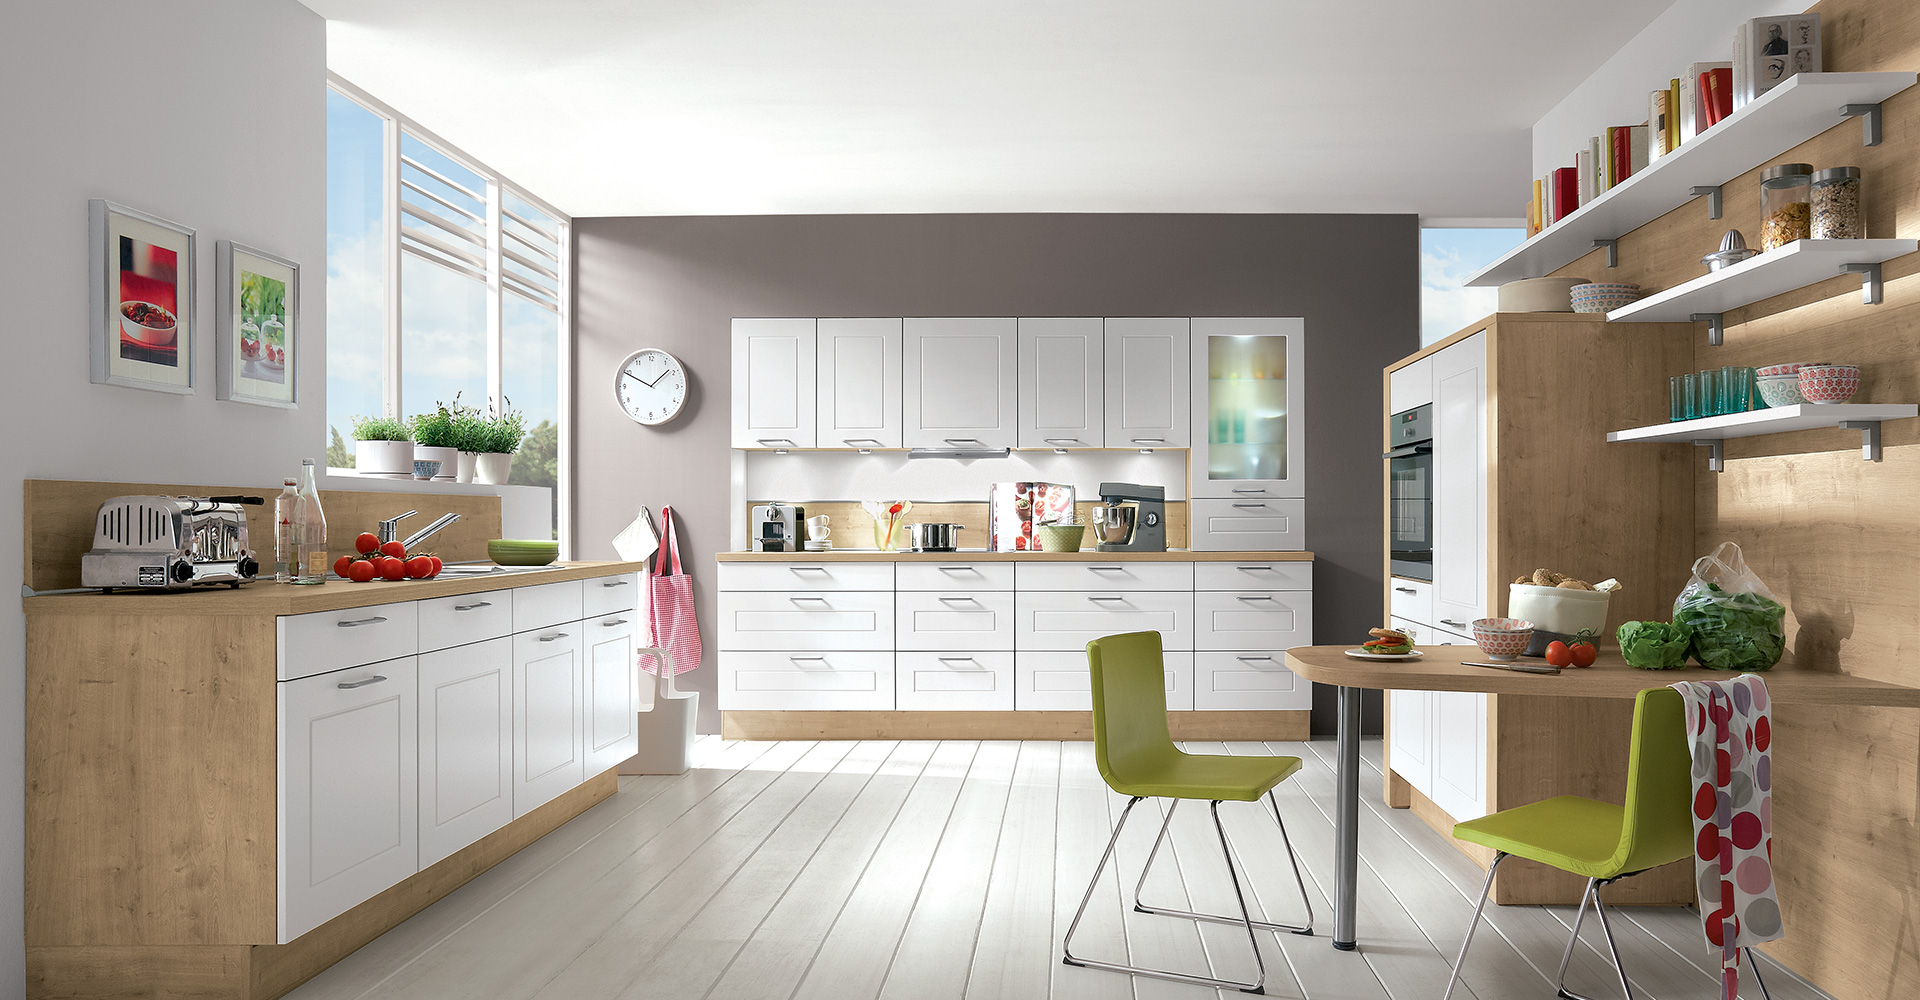 Tijdloze keukens - Eindeloos kookgenot - Otten Keukens & Sanitair